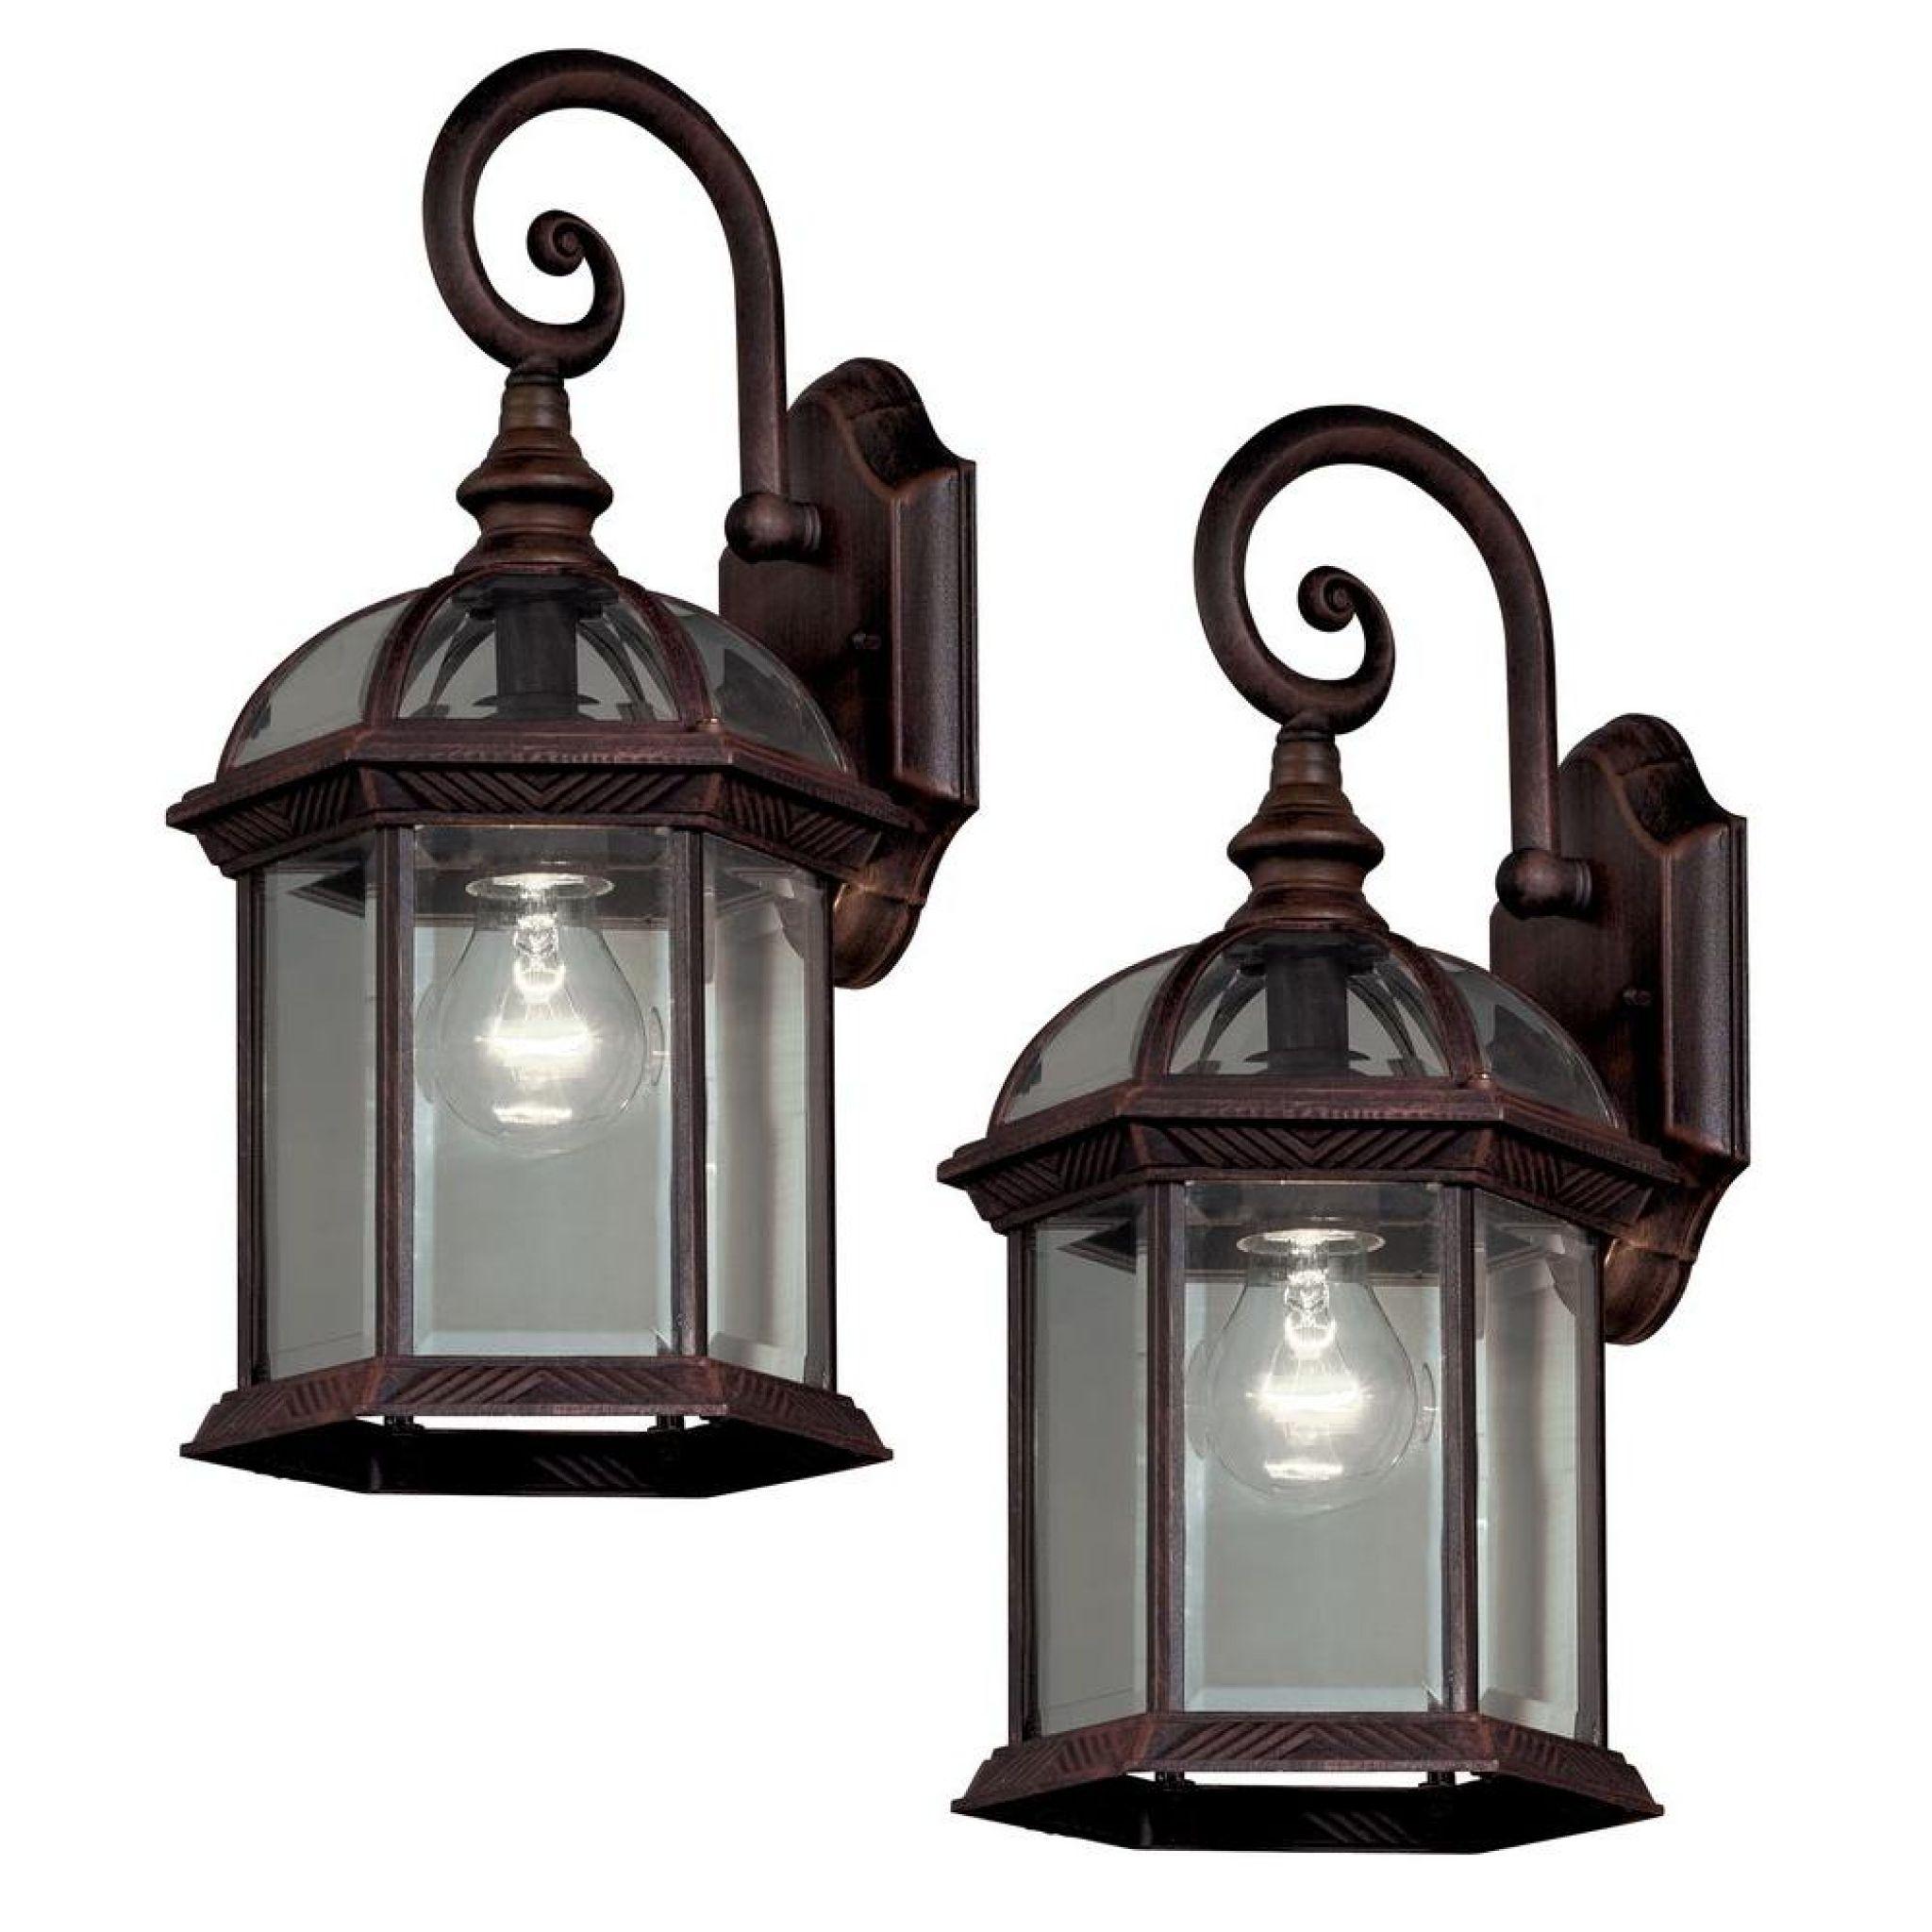 outdoor light fixtures home depot interior house paint ideas Check